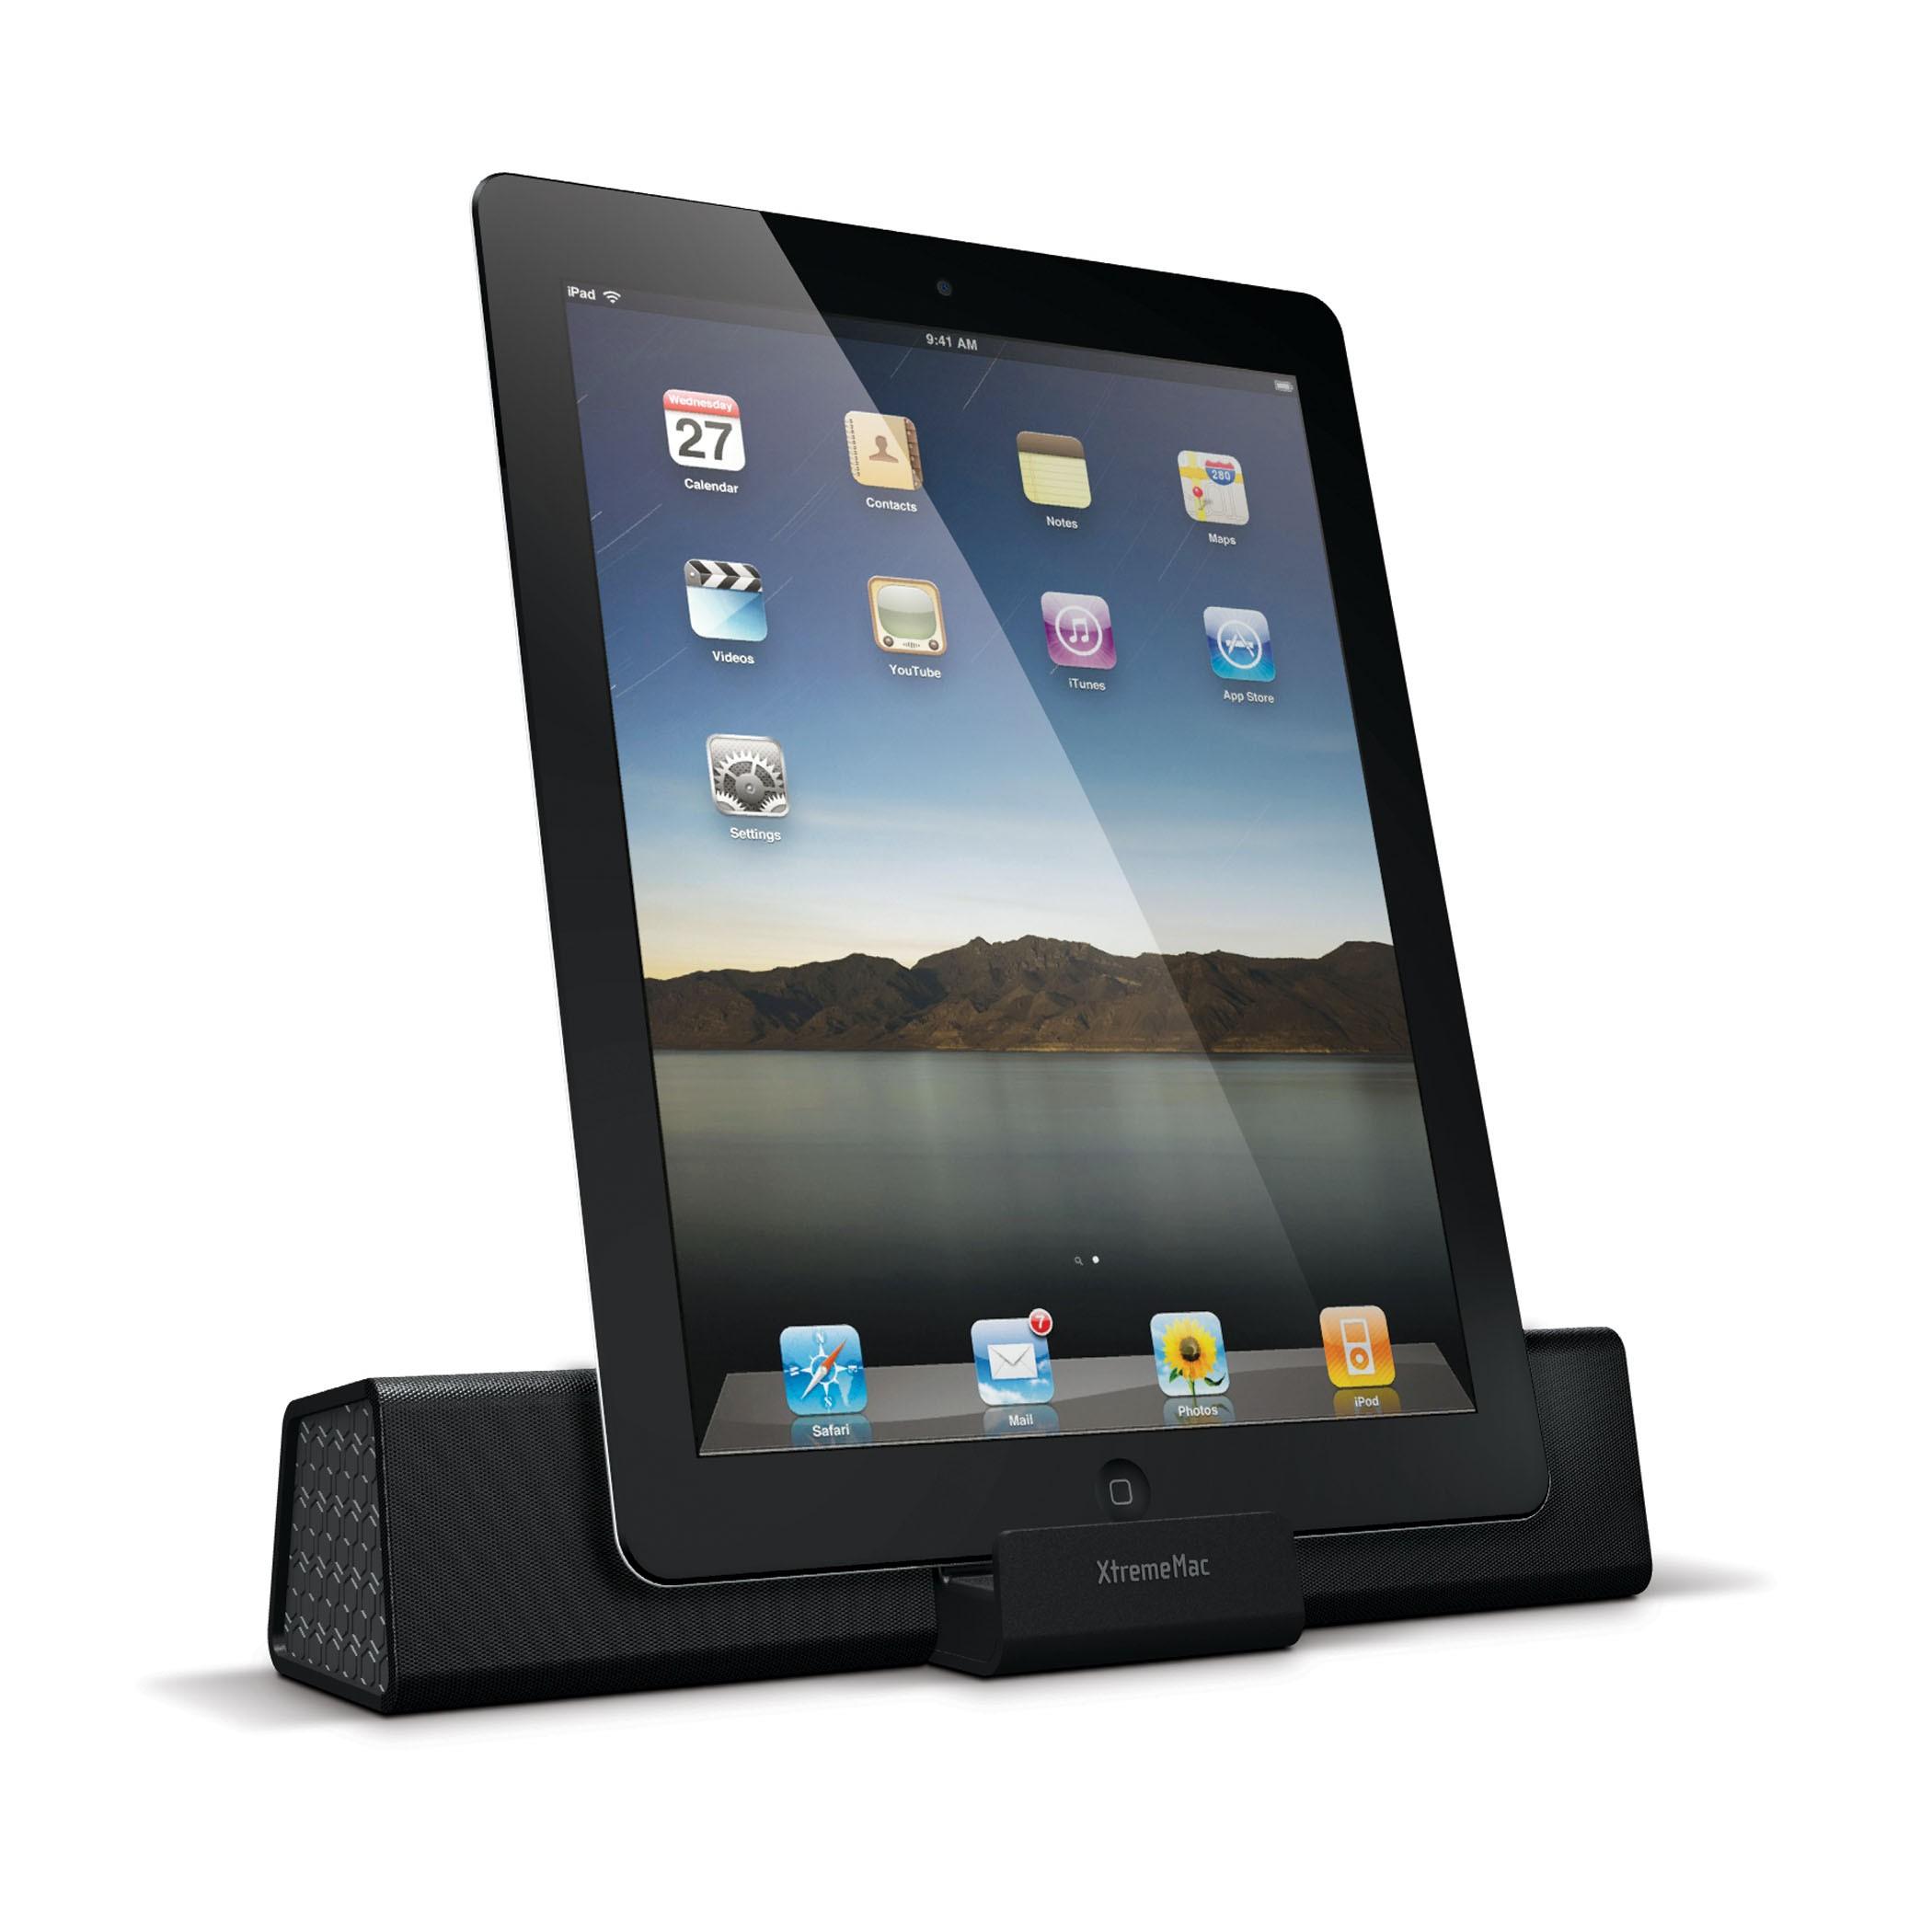 XtremeMac Soma Travel Højtalere til iPad / iPhone / iPod - Sort